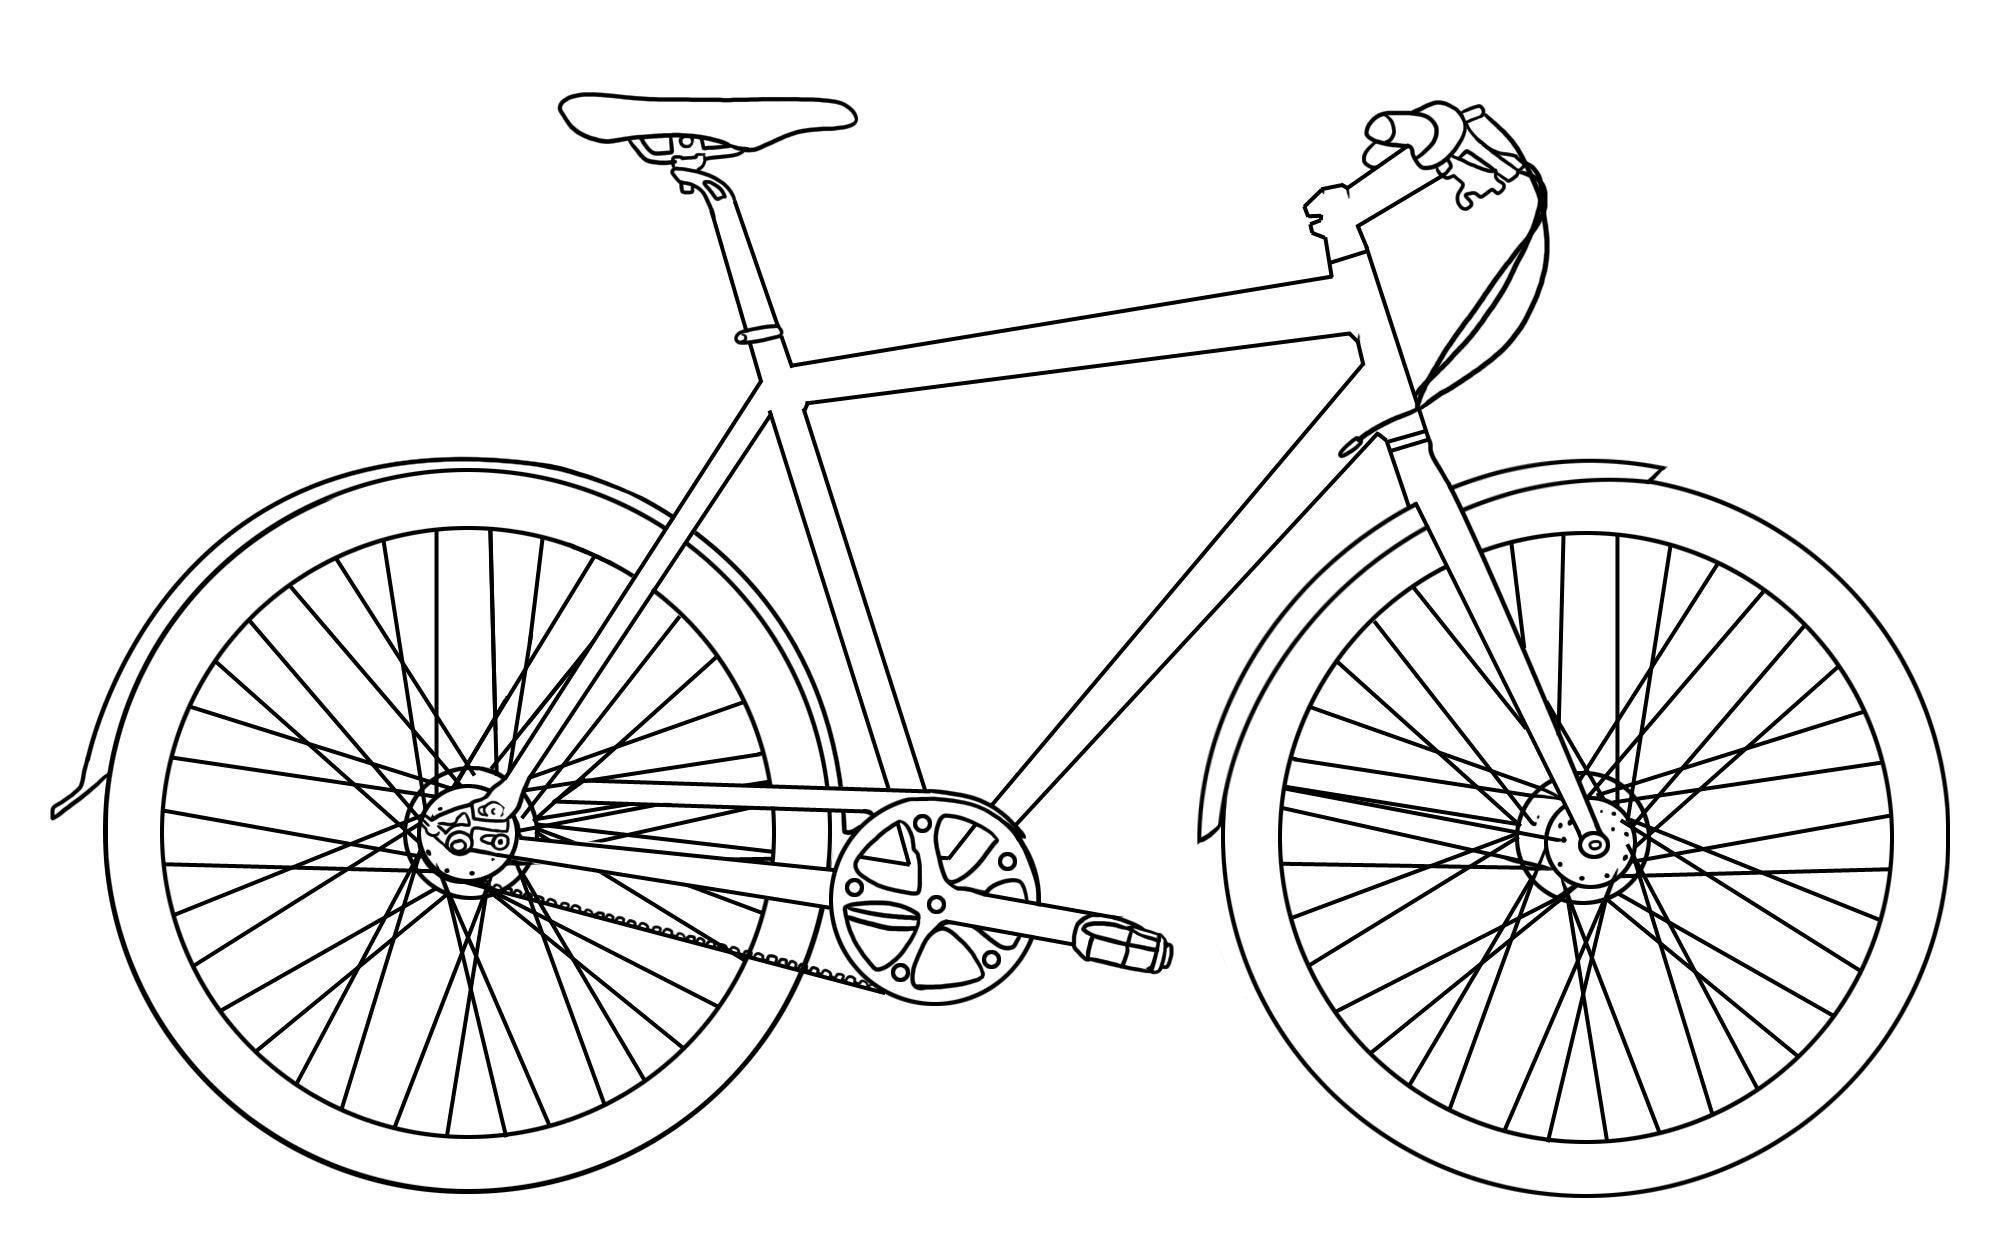 Ausmalbilder Fahrrad  GRATIS AUSMALBILDER FAHRRäDER Ausmalbilder